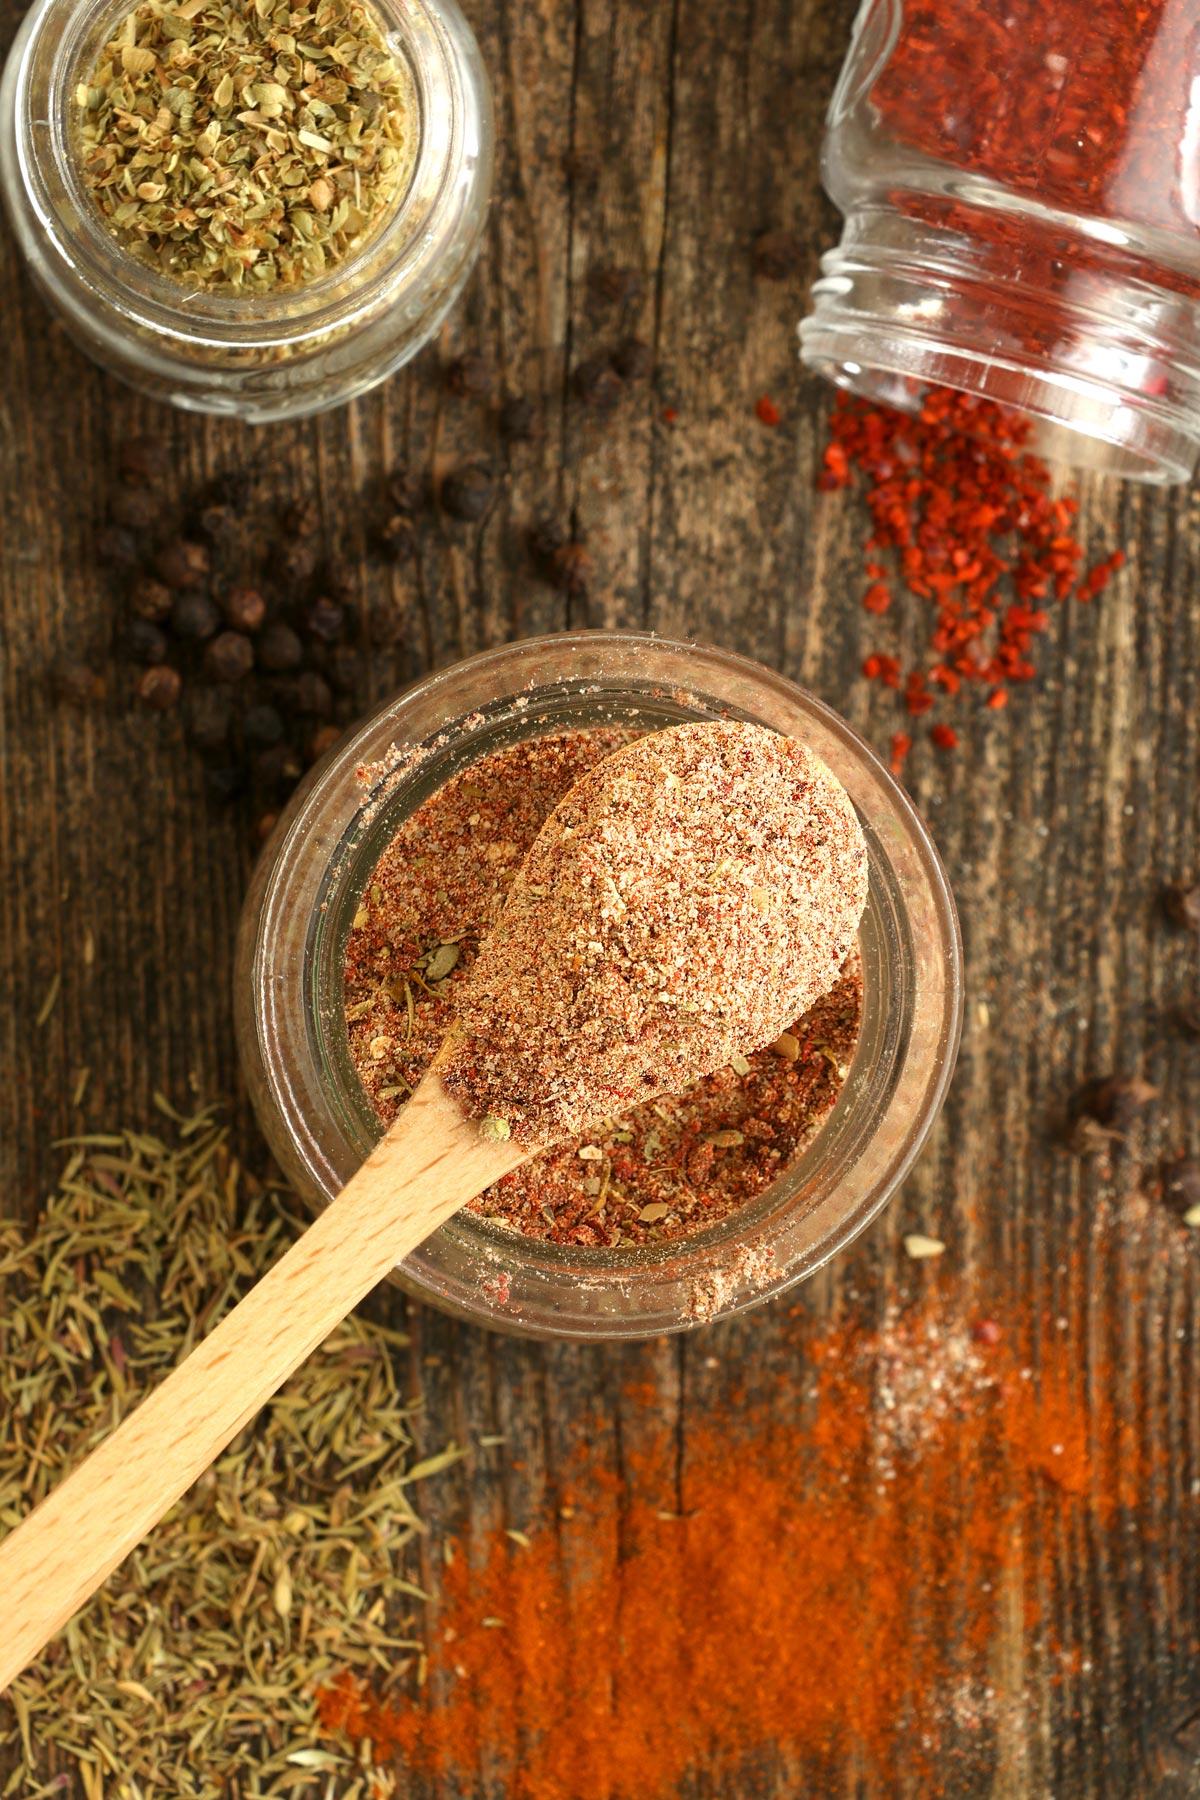 A jar of Cajun seasoning made from scratch.